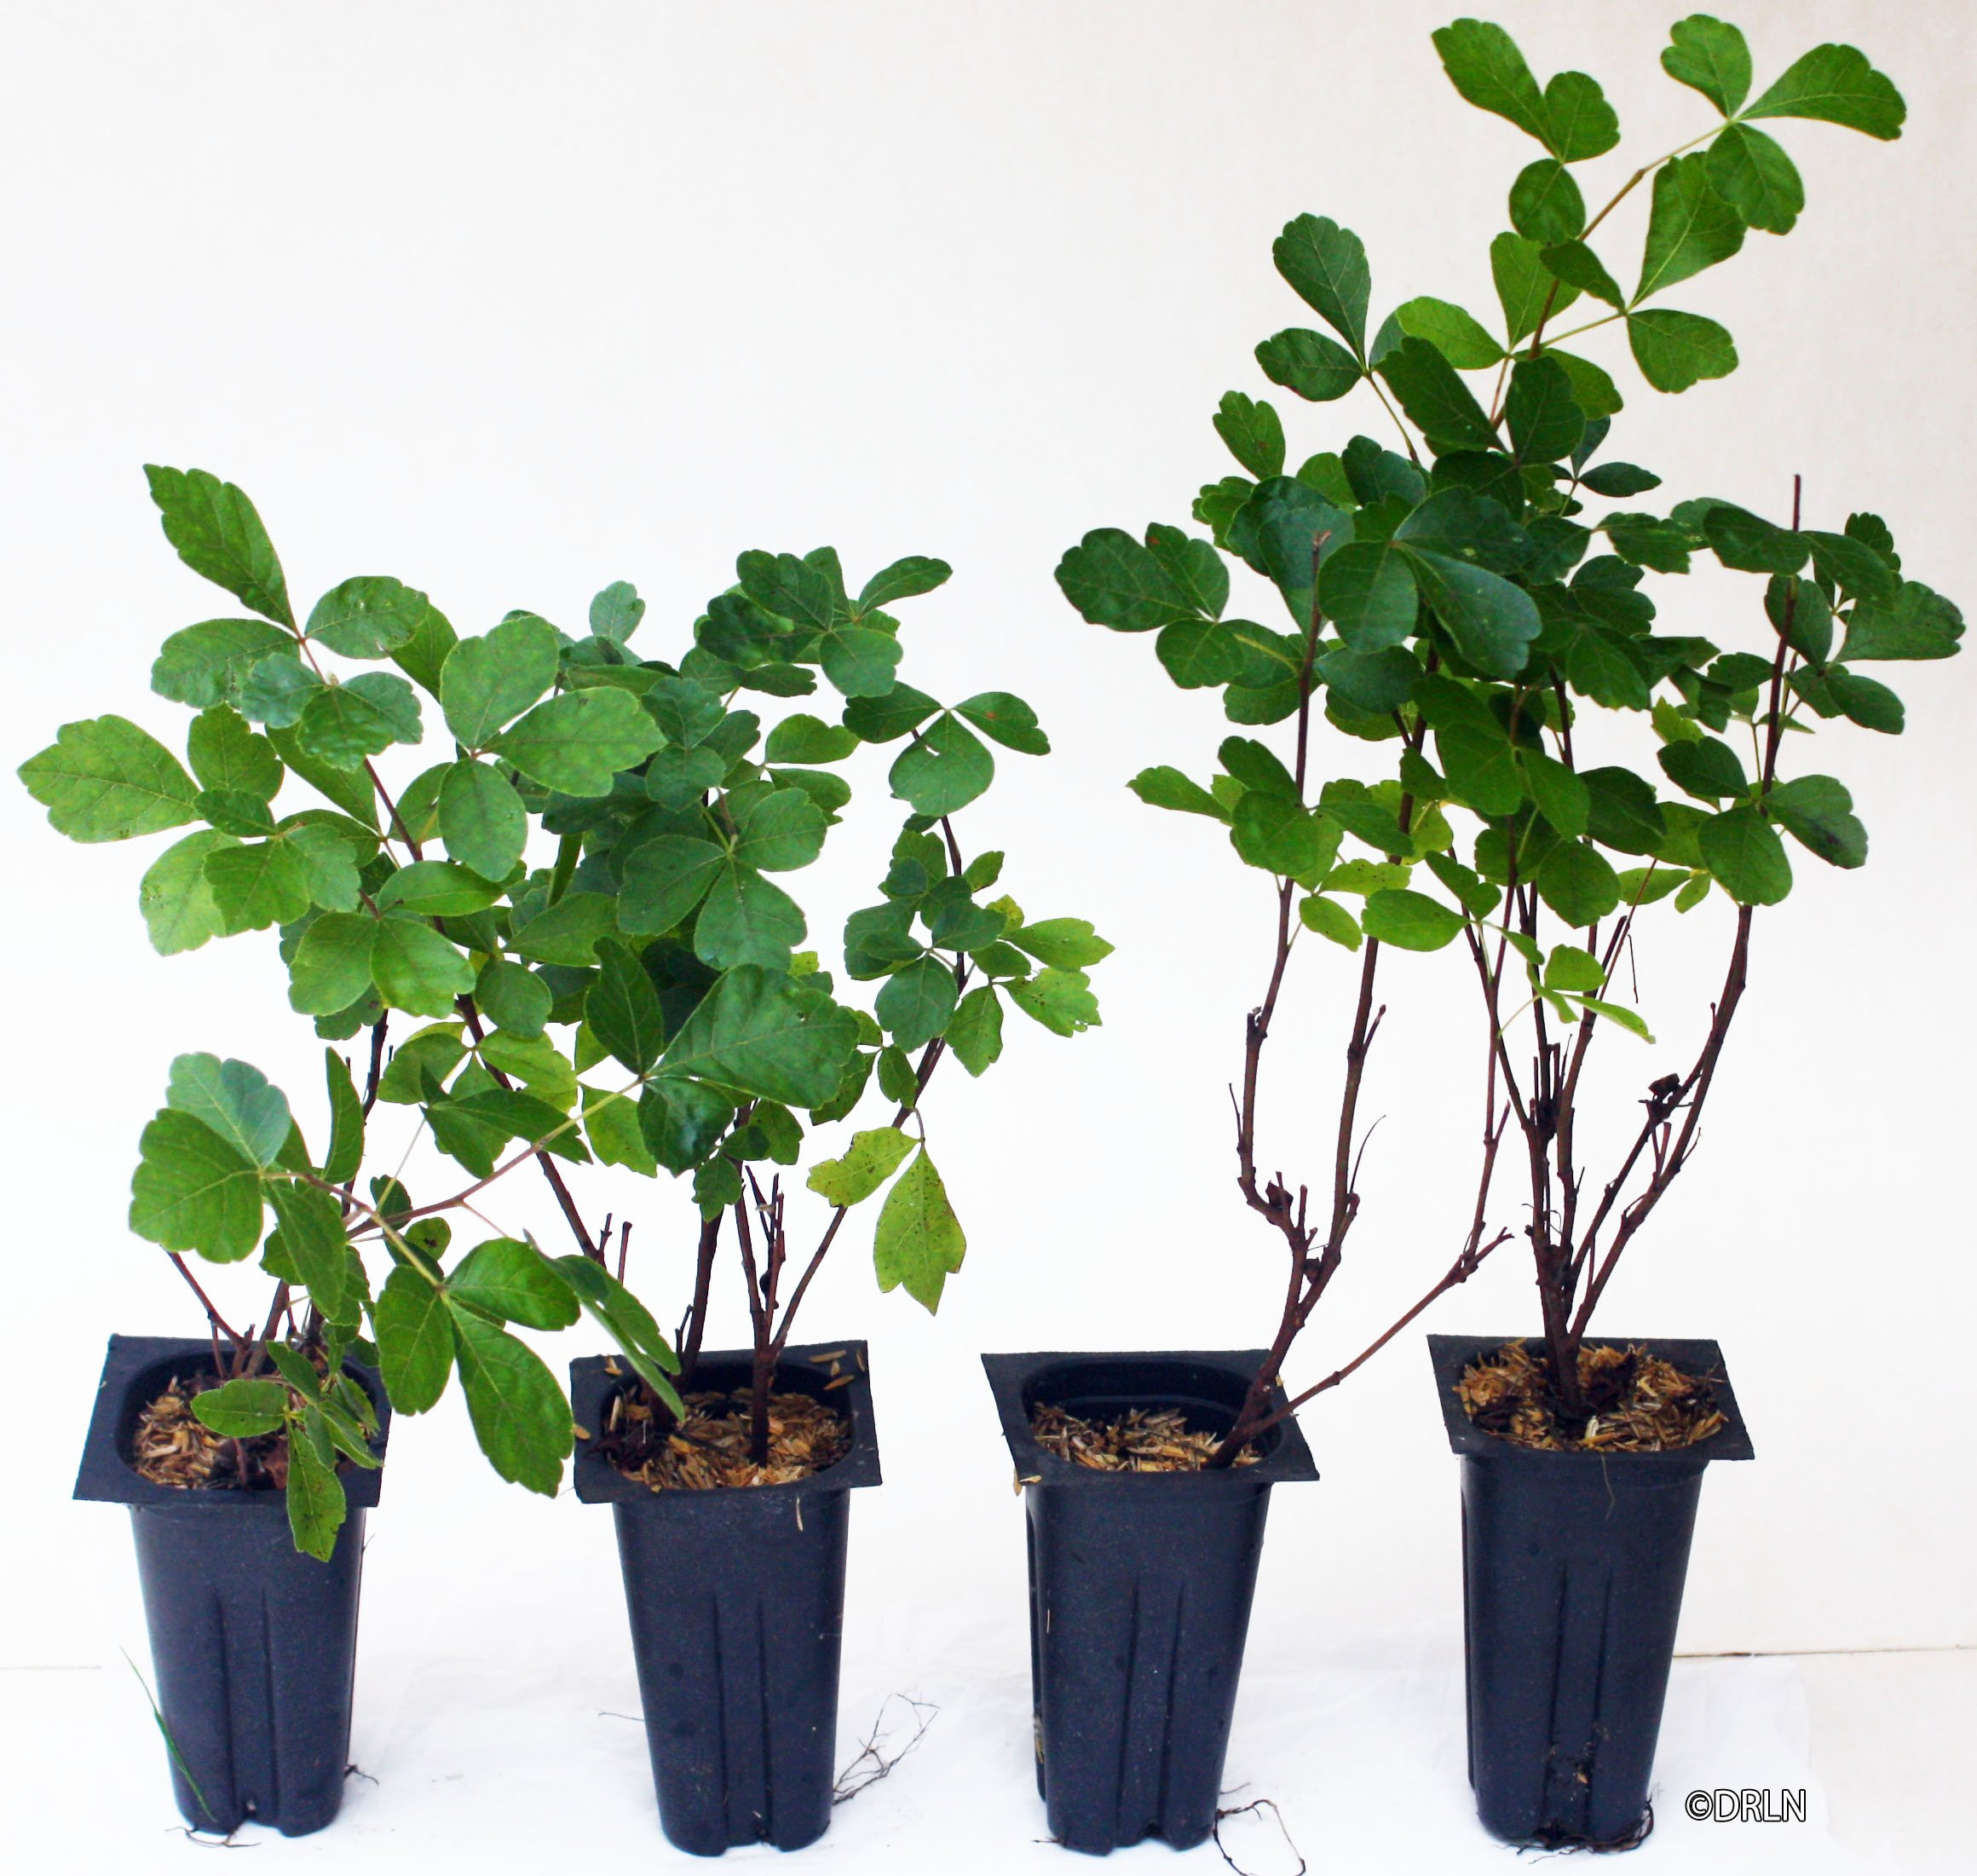 Rhus aromatica Gro-Low Package of 12 plants in 2.5'' pots